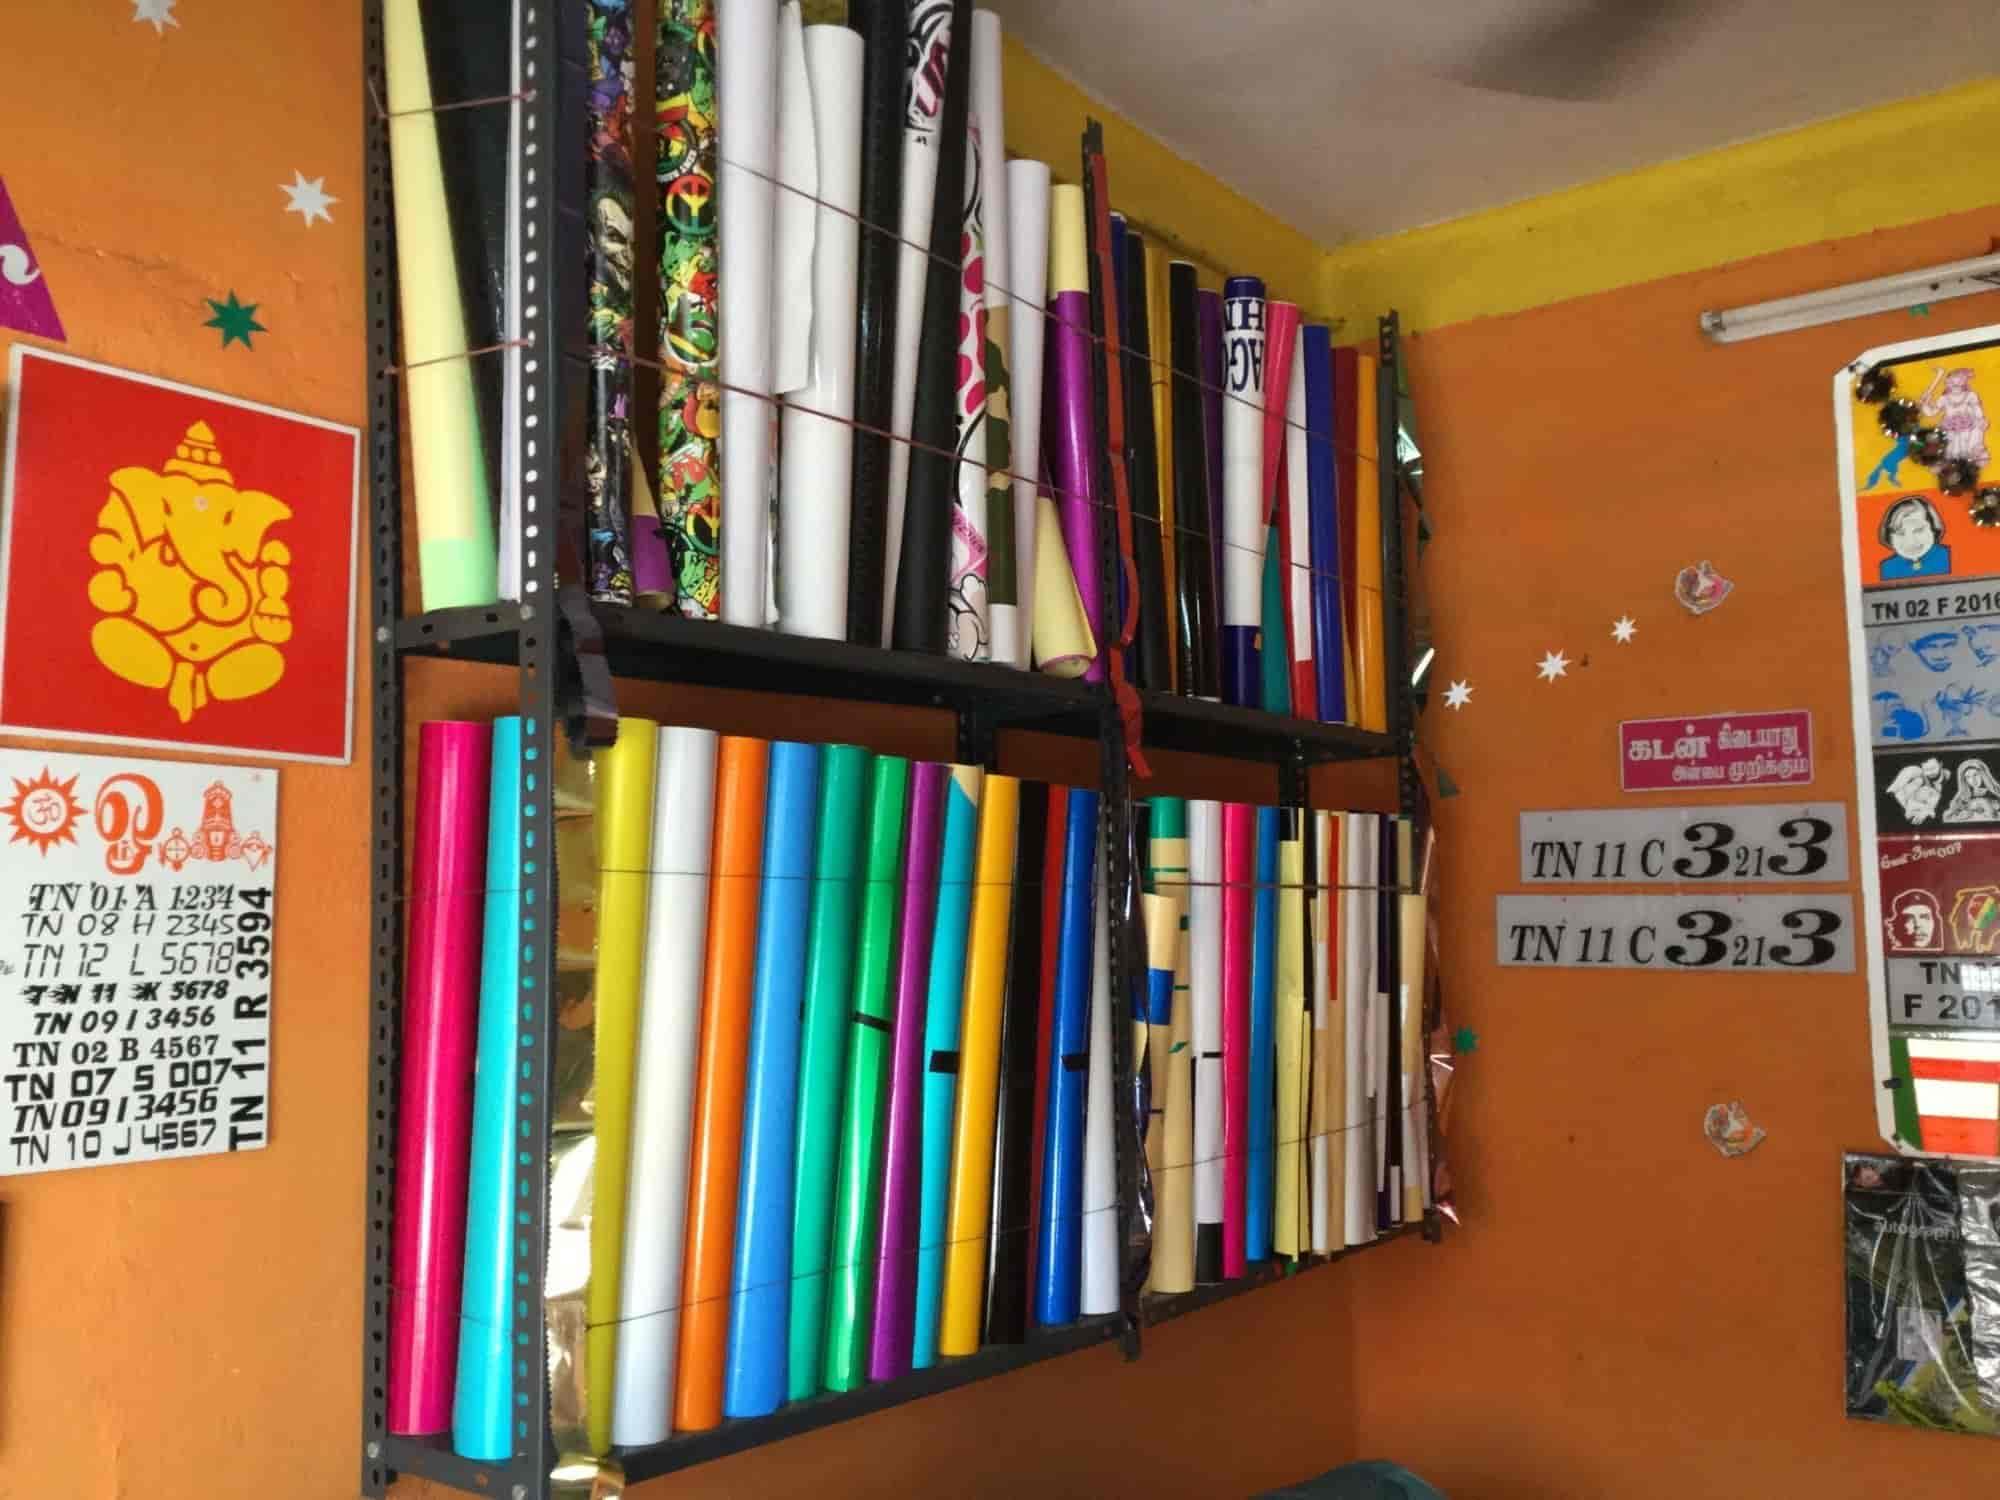 Inside view of radium sticker shop sri iyappa digital photos mudichur chennai